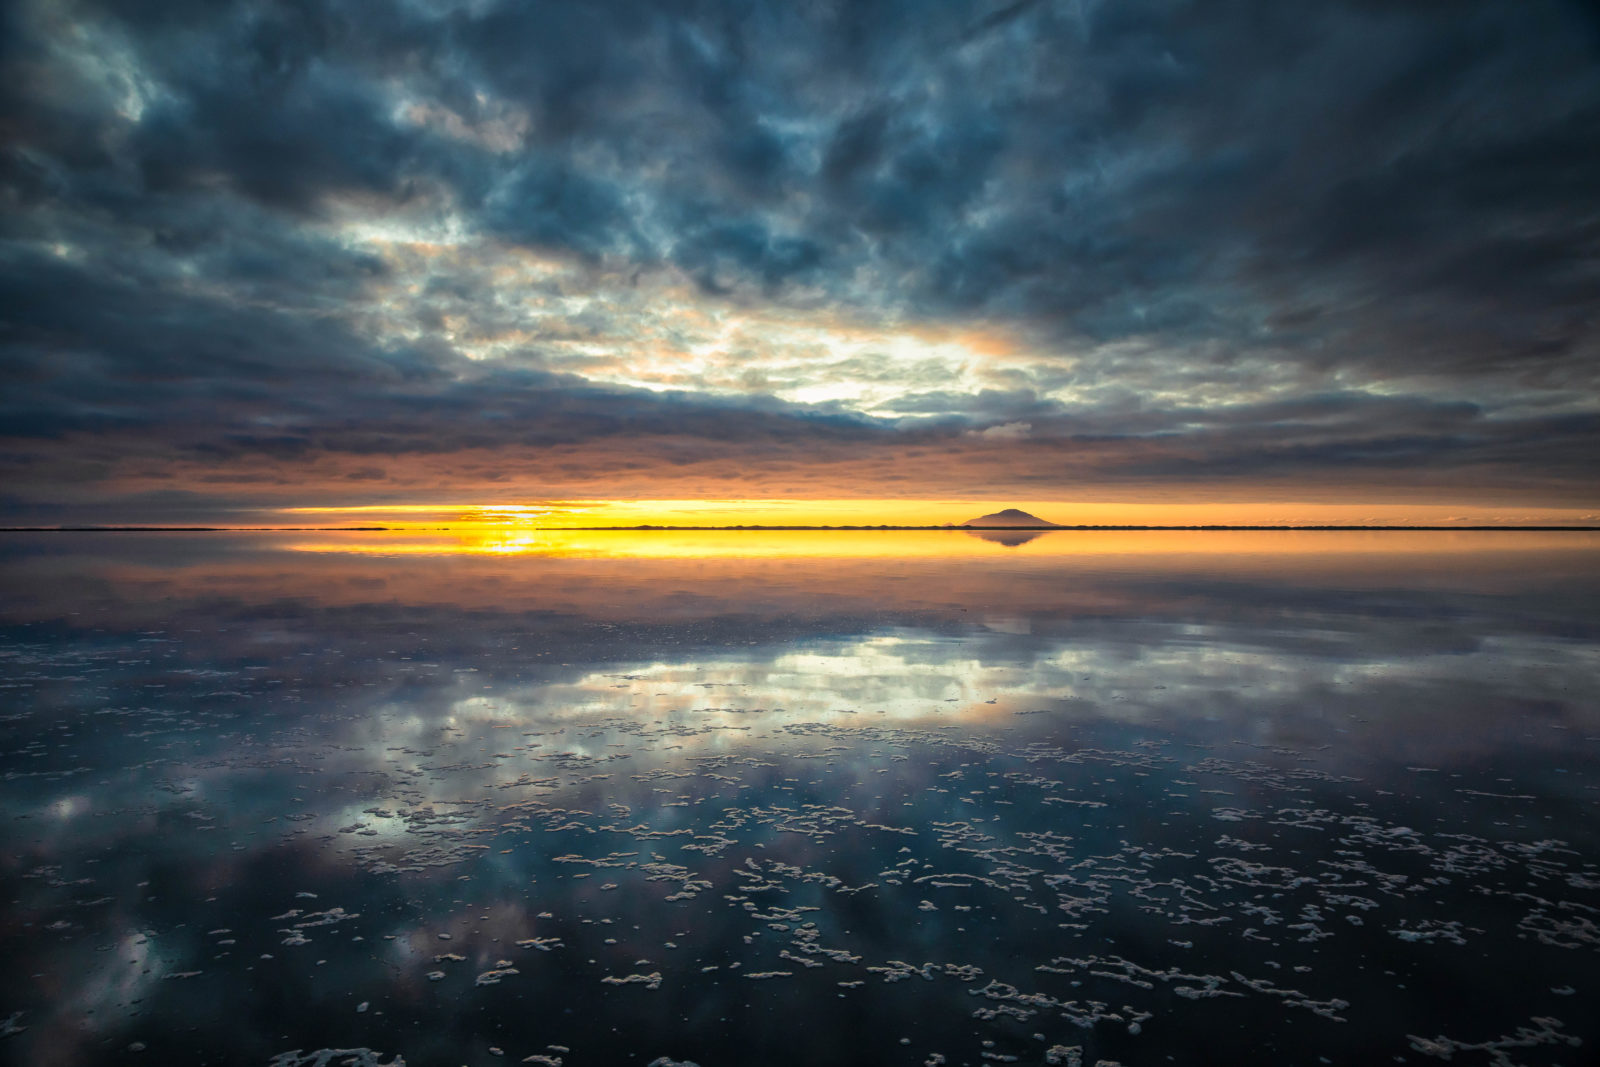 Protecting Izembek means protecting vital wetlands like Izembek Lagoon.